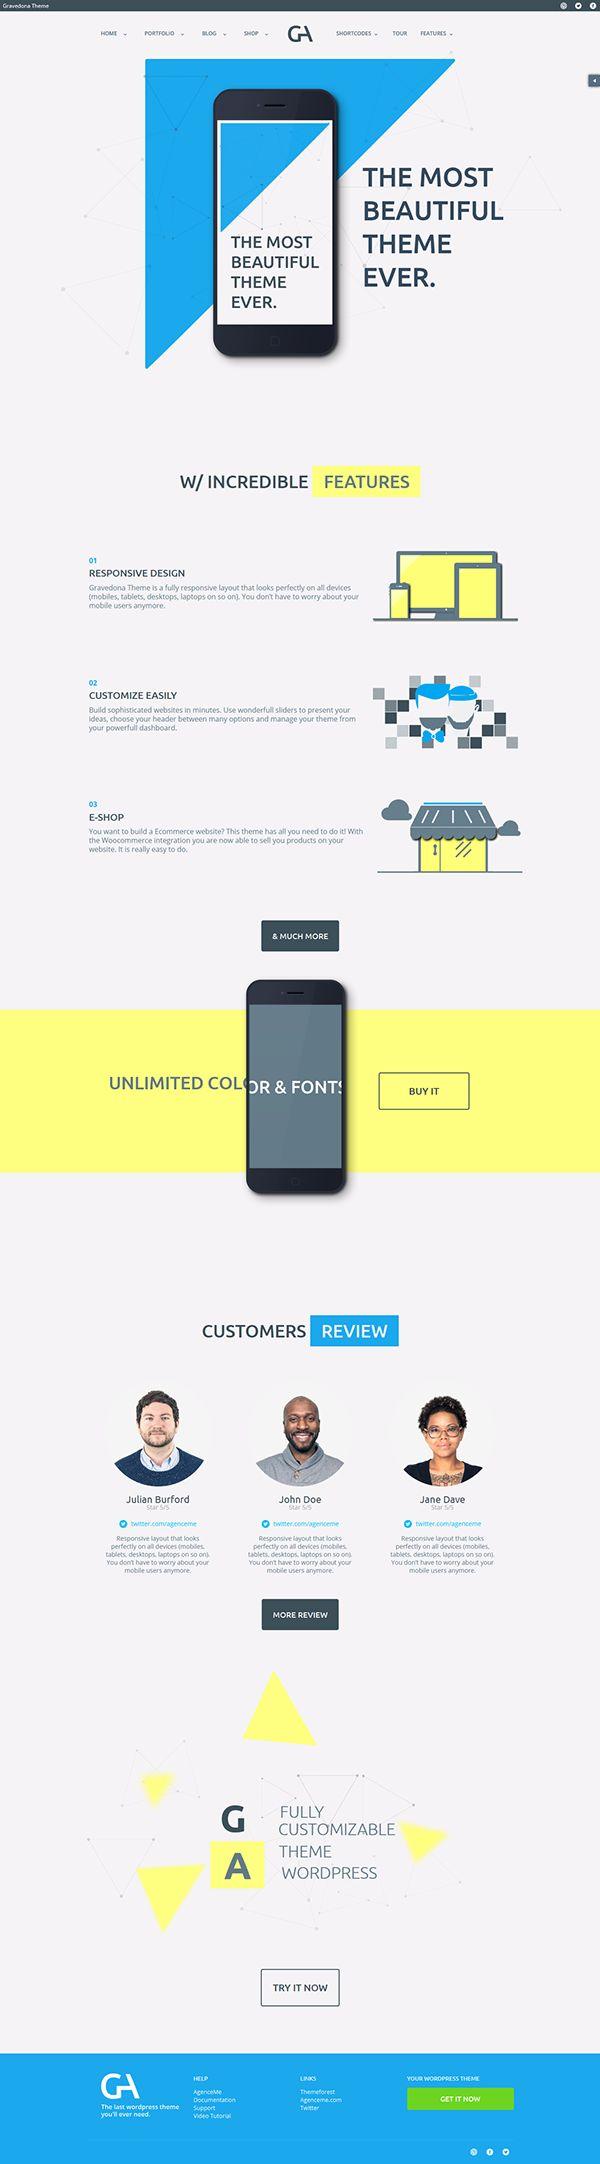 Unique Web Design, Gravedona #WebDesign #Design (http://www.pinterest.com/aldenchong/)